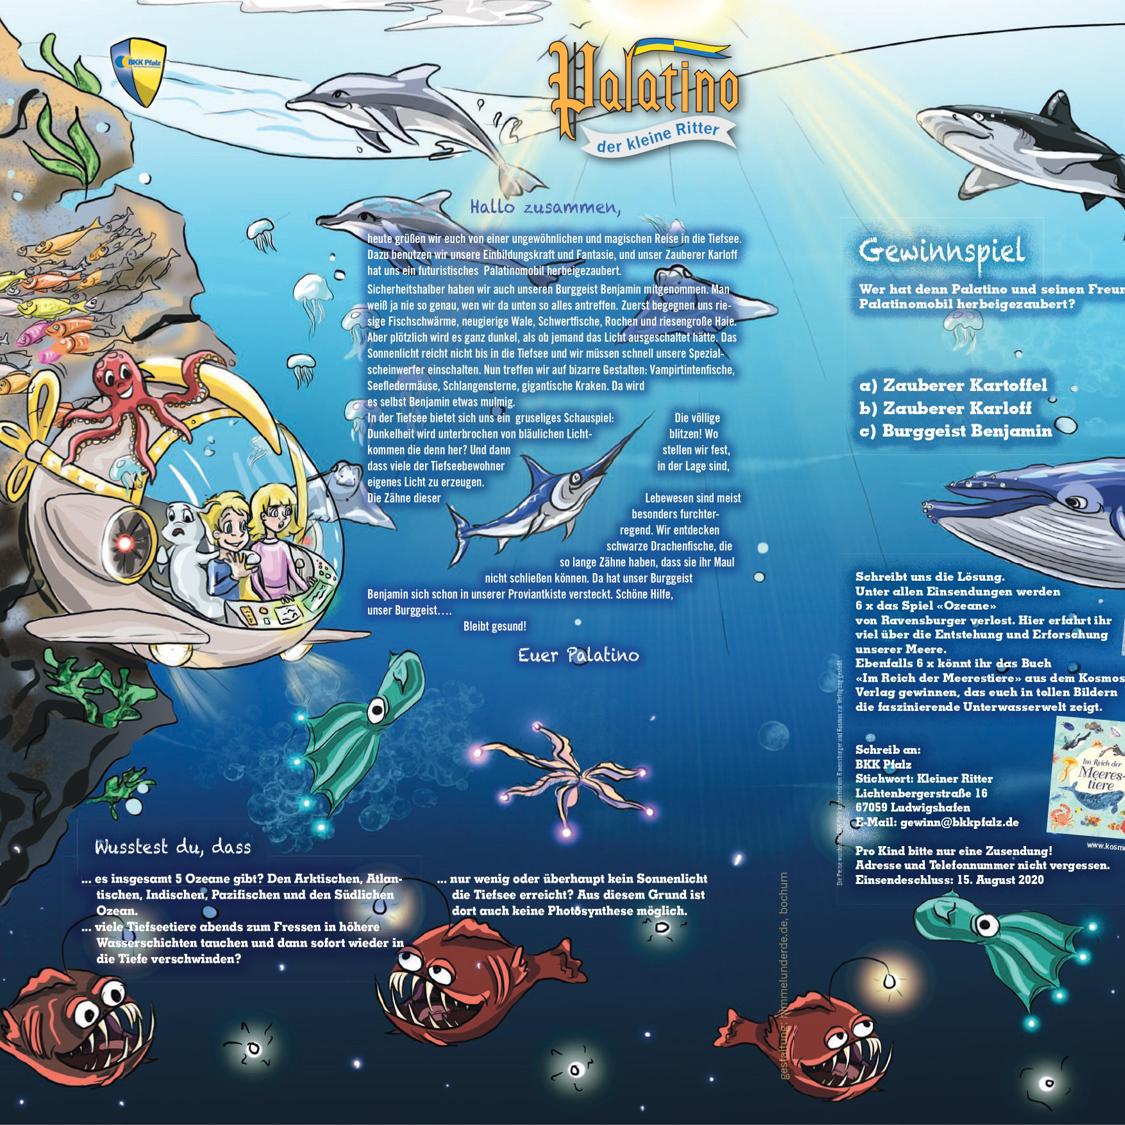 Bild: BKK Pfalz Magazin Kinderseiten mit Palatino